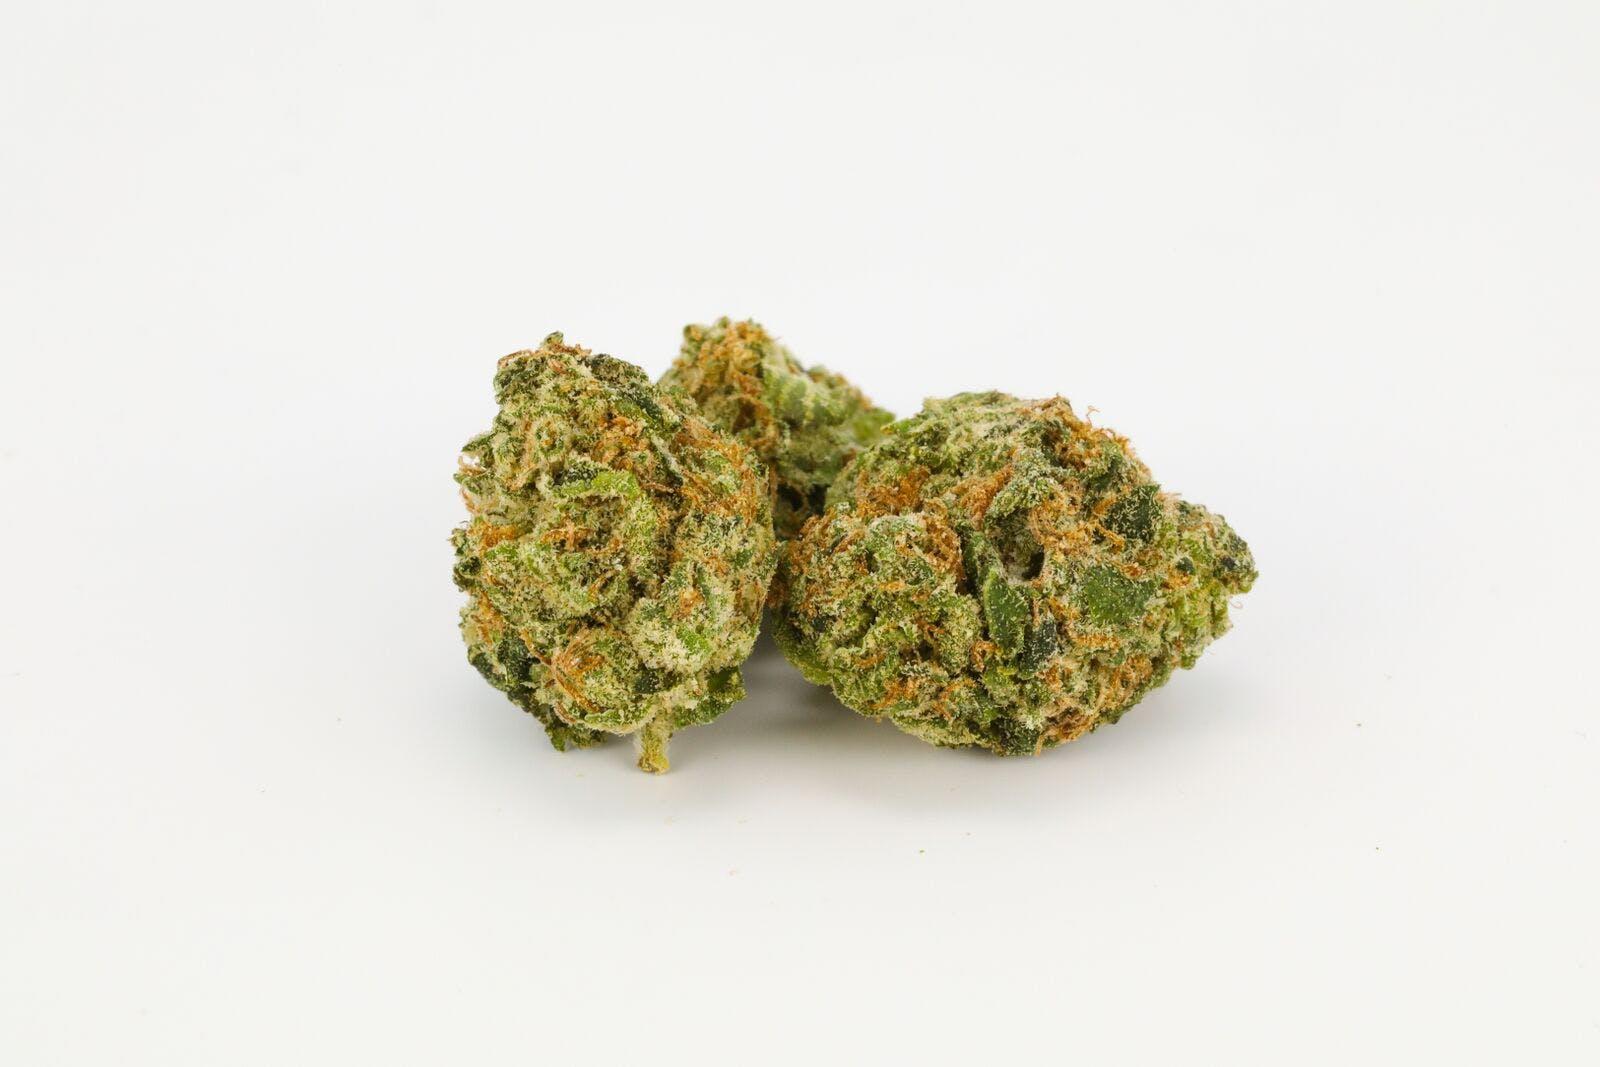 Cali Gold Weed; Cali Gold Cannabis Strain; Cali Gold Hybrid Marijuana Strain